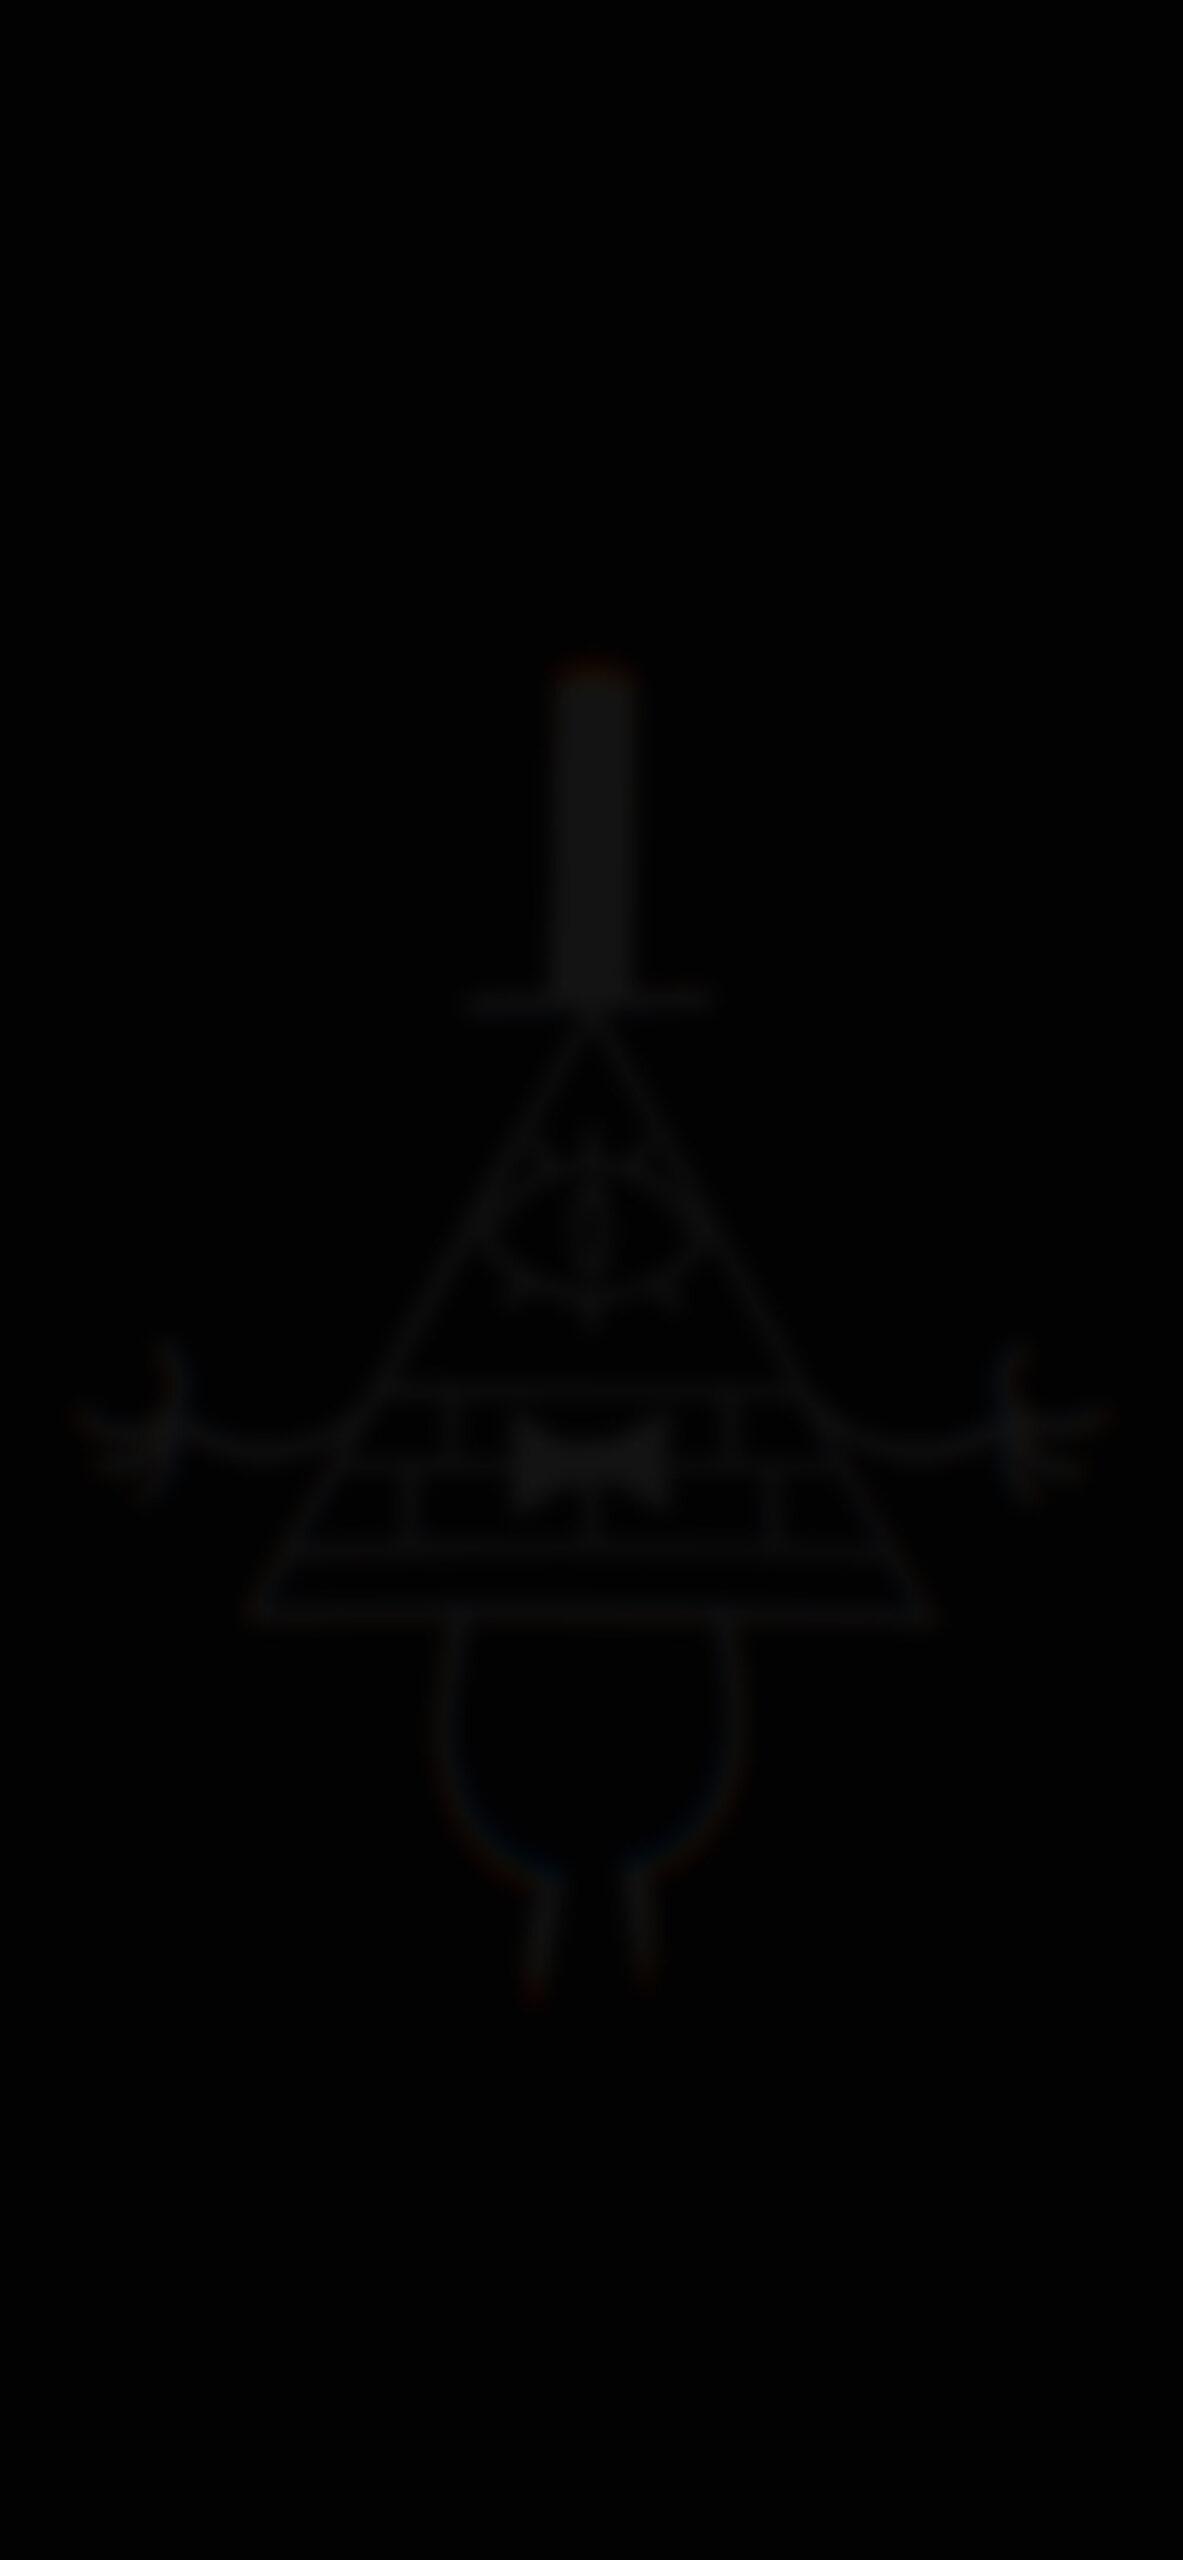 gravity falls bill cipher deep black blur wallpaper